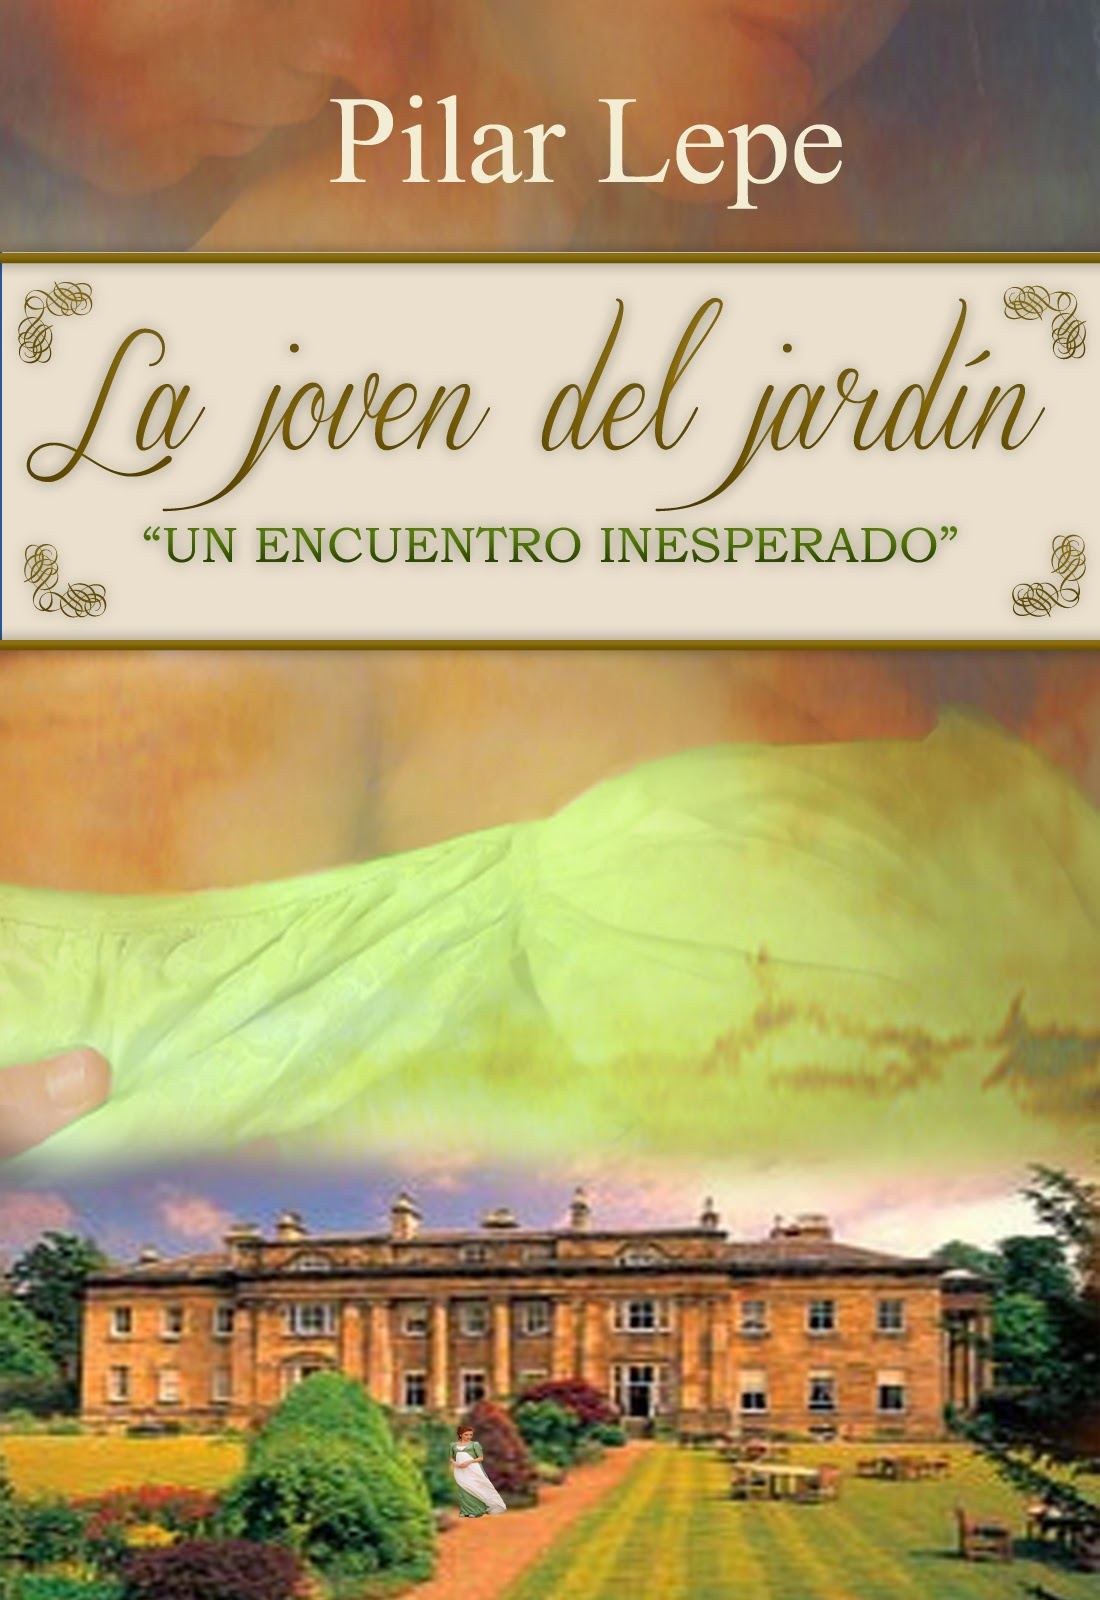 lepe - La joven del jardín - Pilar Lepe (Rom) Sin+t%C3%ADtulo-3